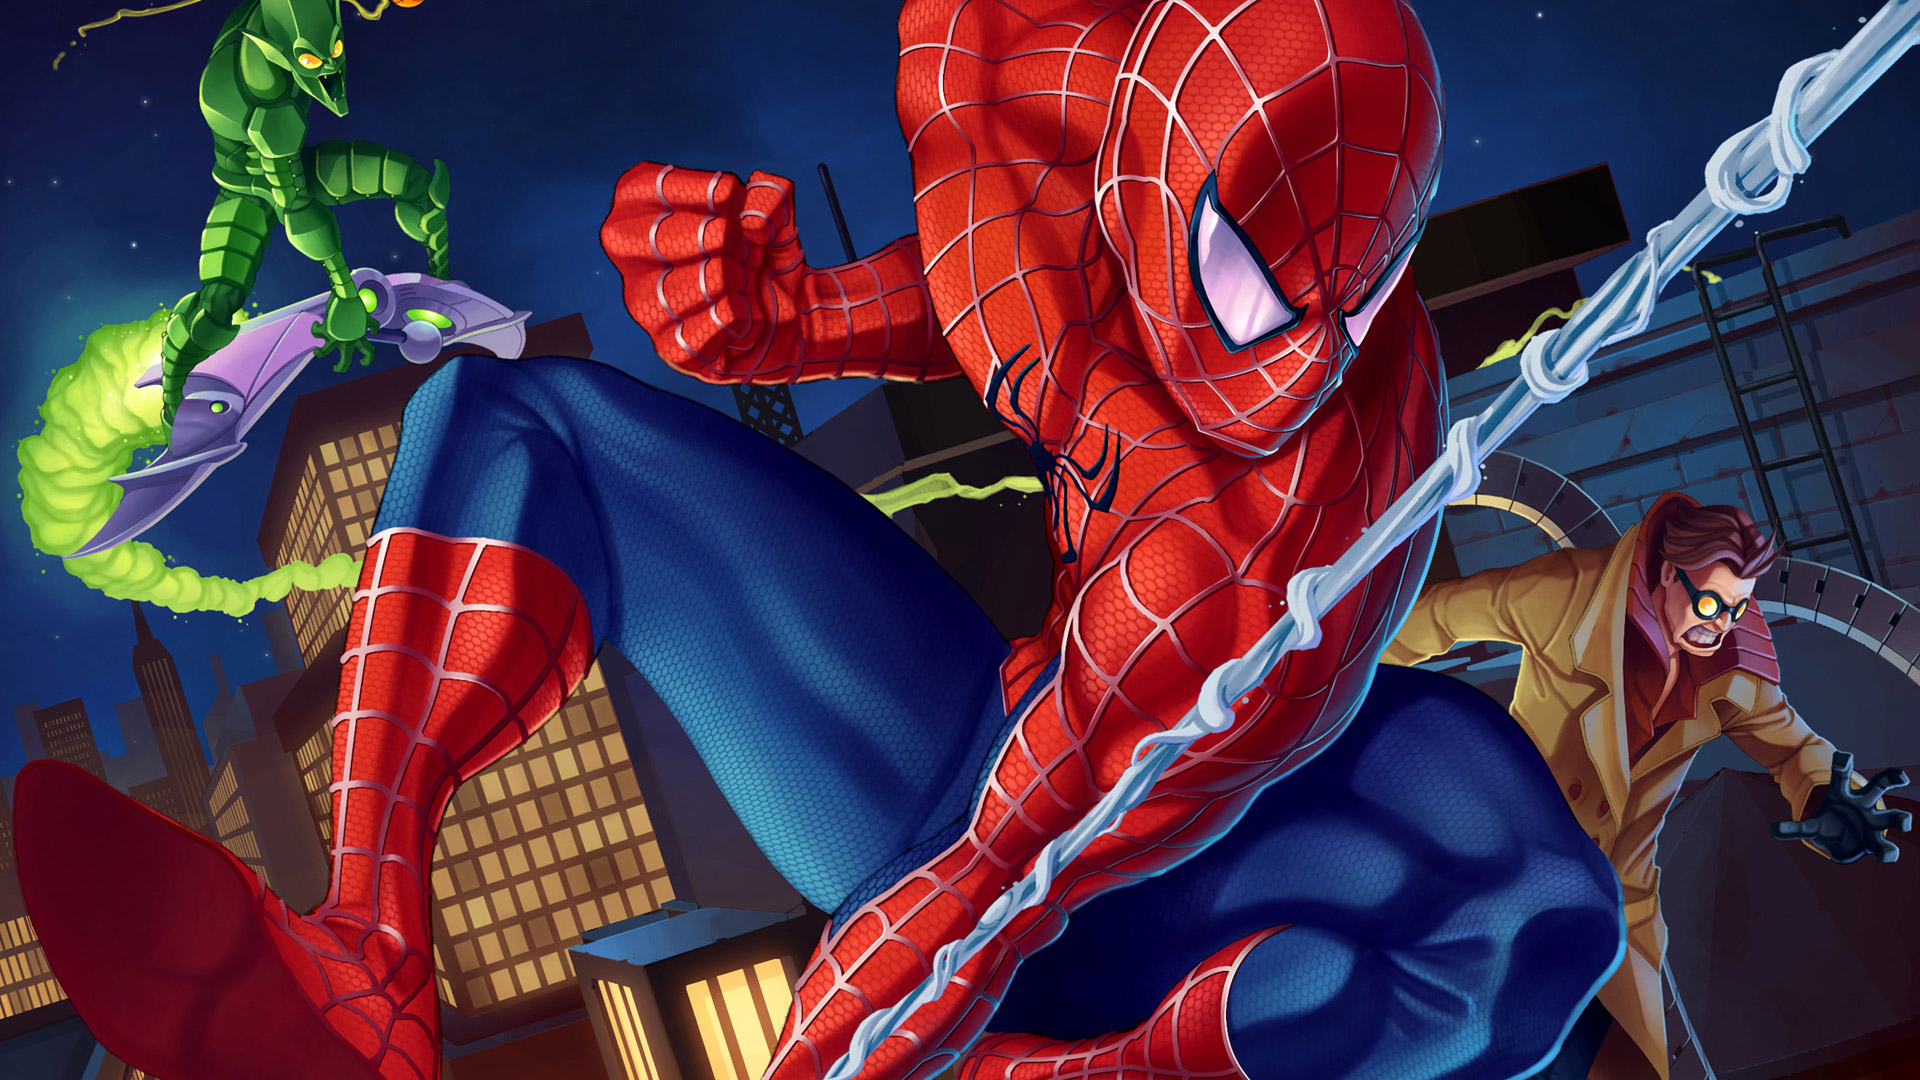 Spider-Man: Friend or Foe Wallpaper in 1920x1080